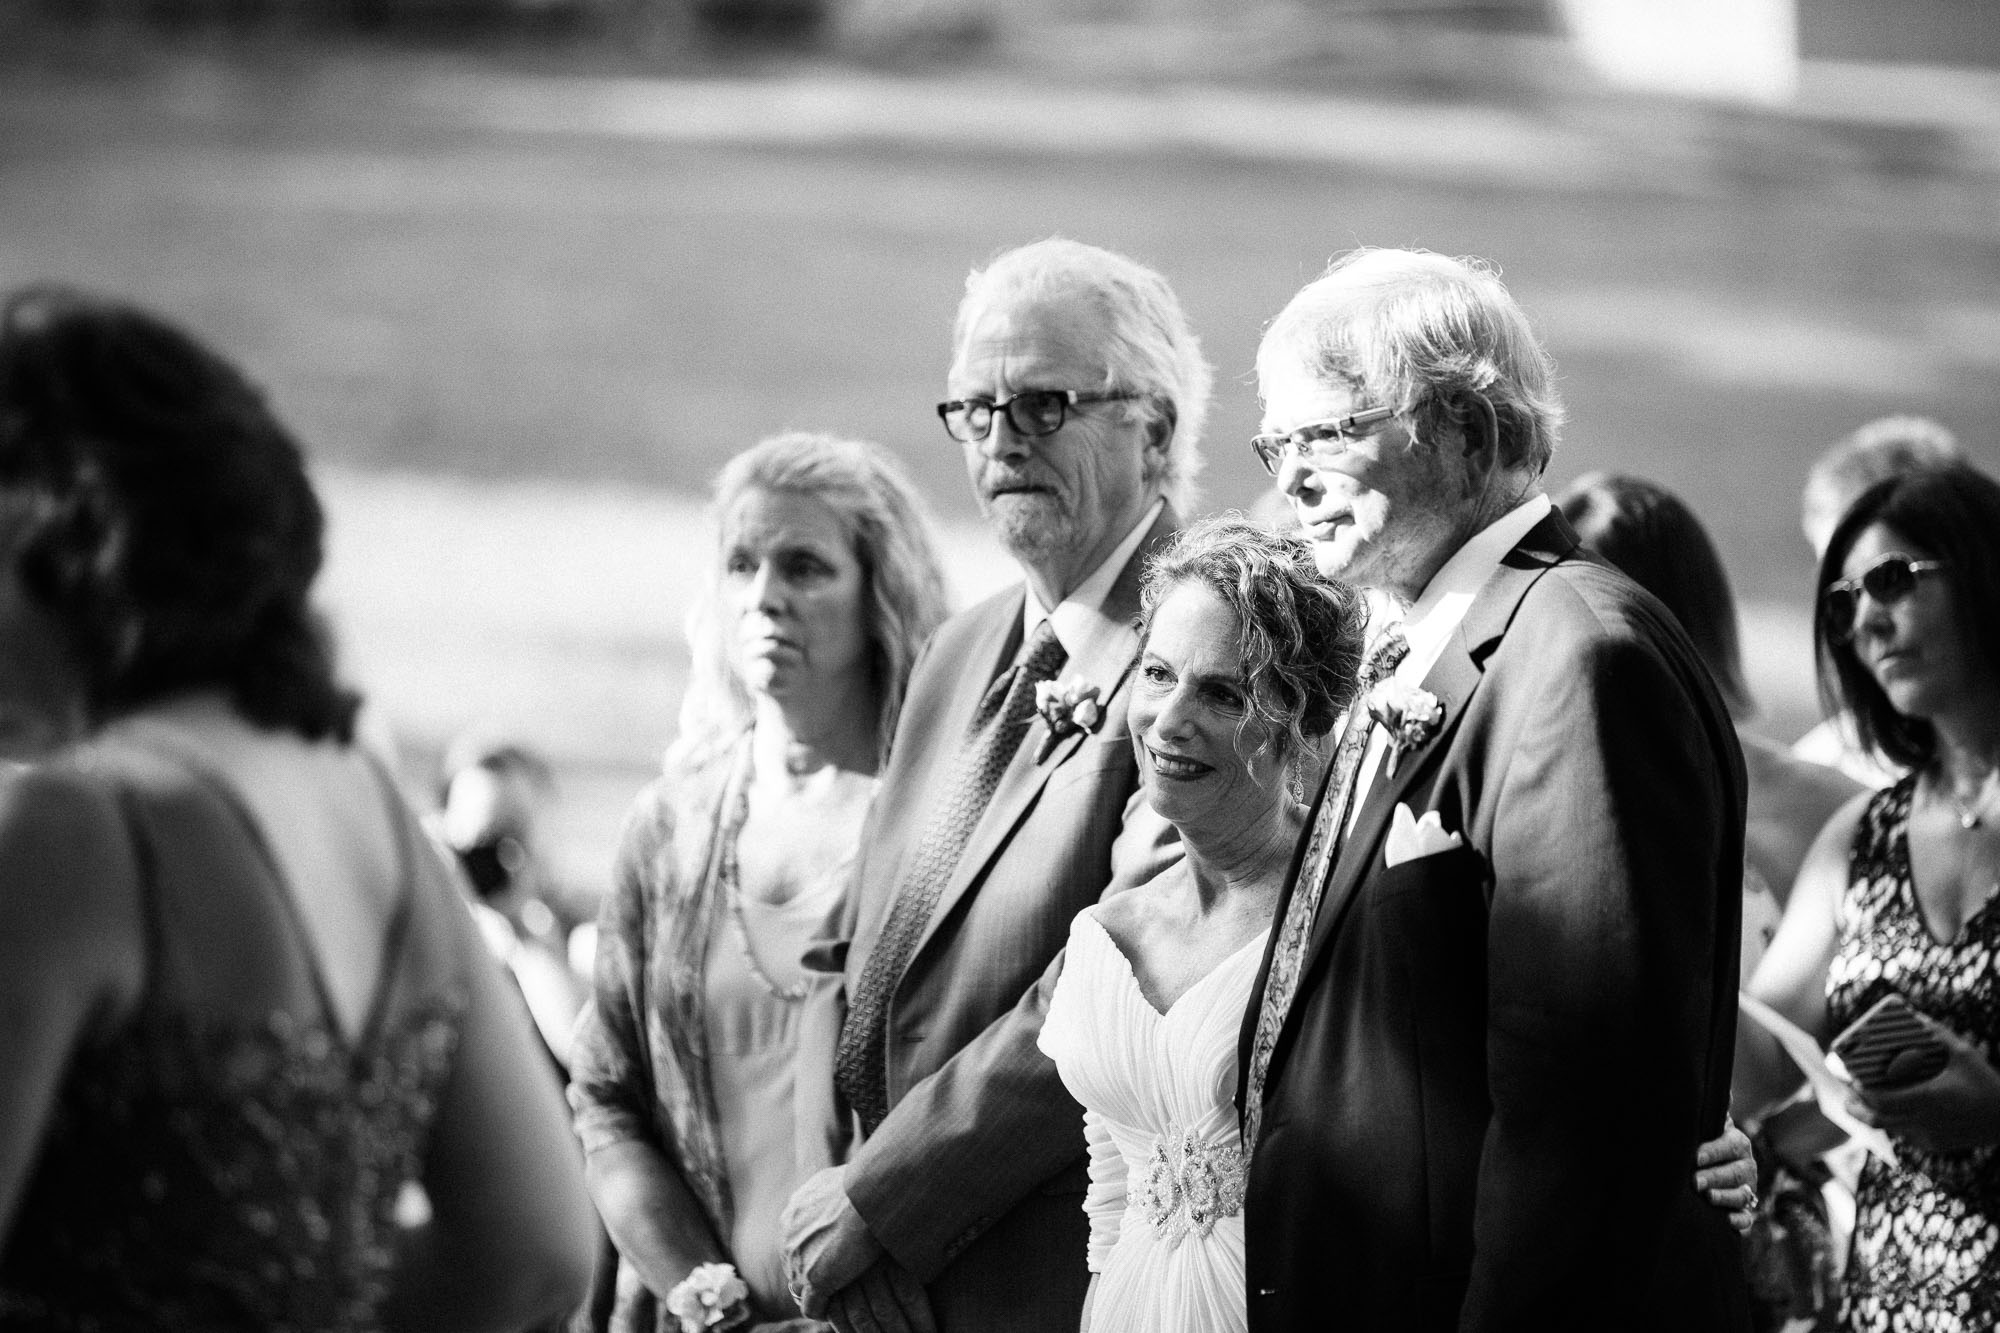 Allenberry-resort-historic-pennsylvania-wedding-21906.jpg